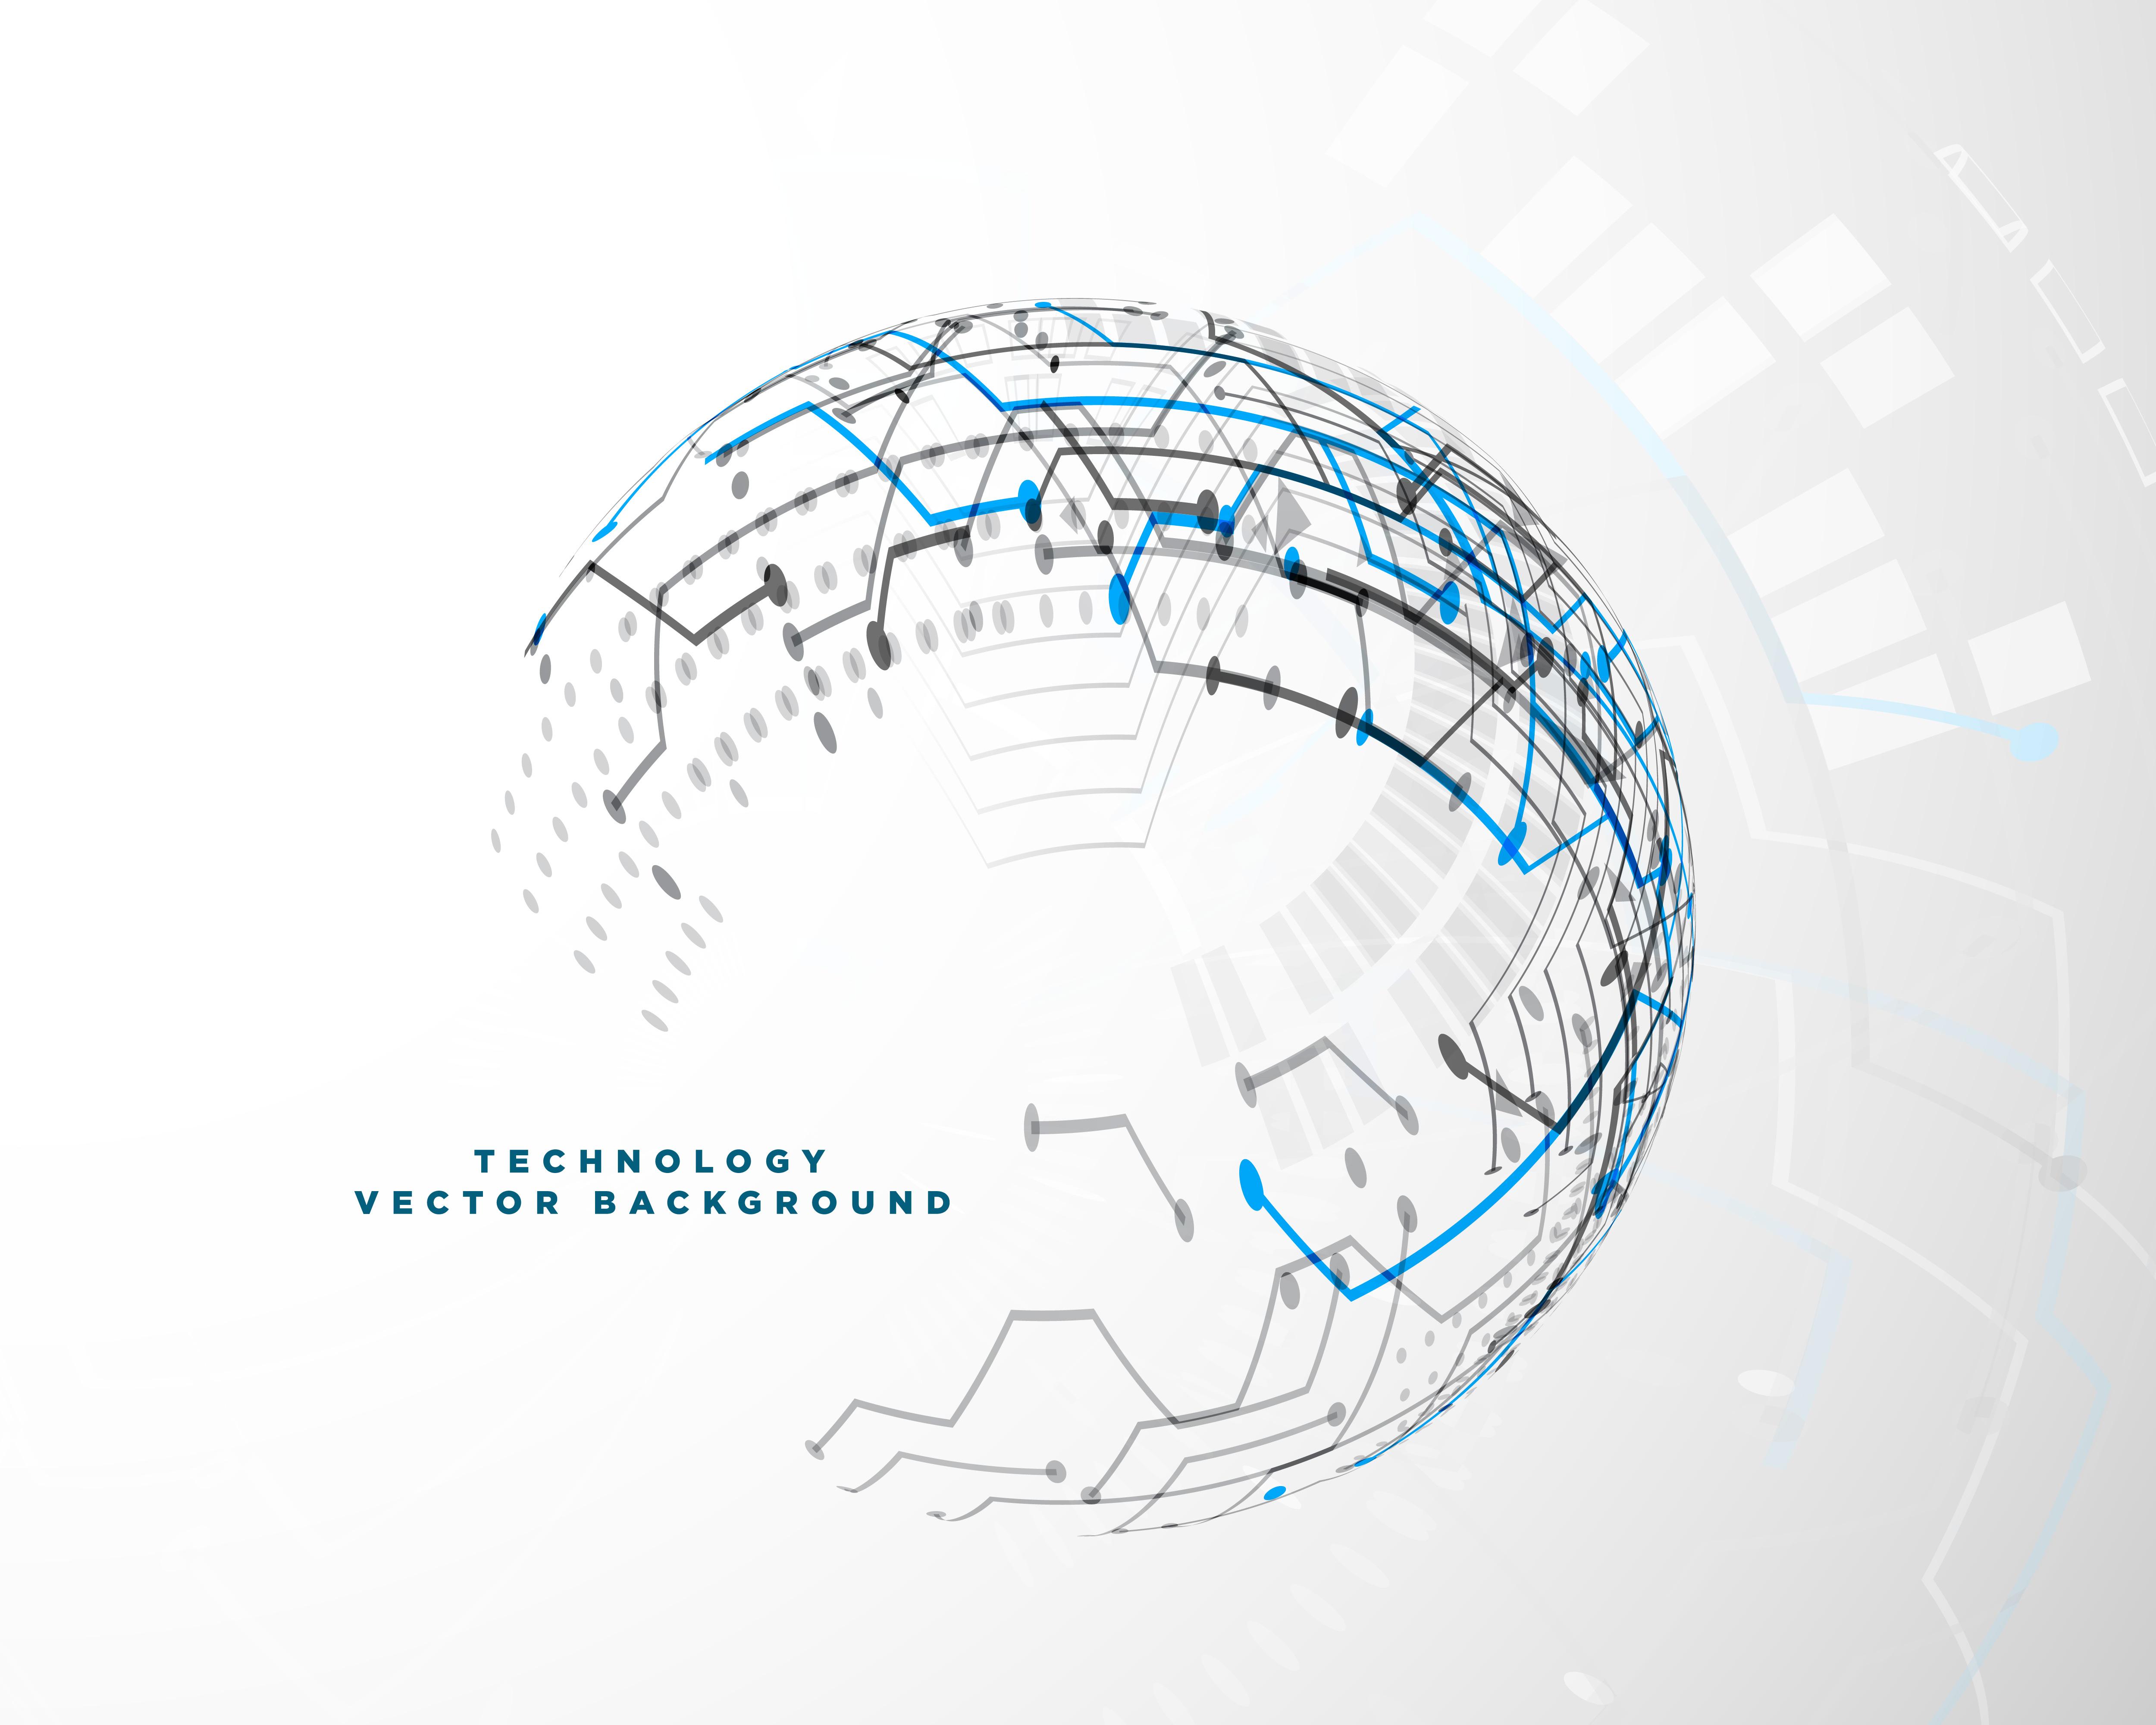 Technologie-Innovation-Konzept-Design mit digitalem Netzwerk ...